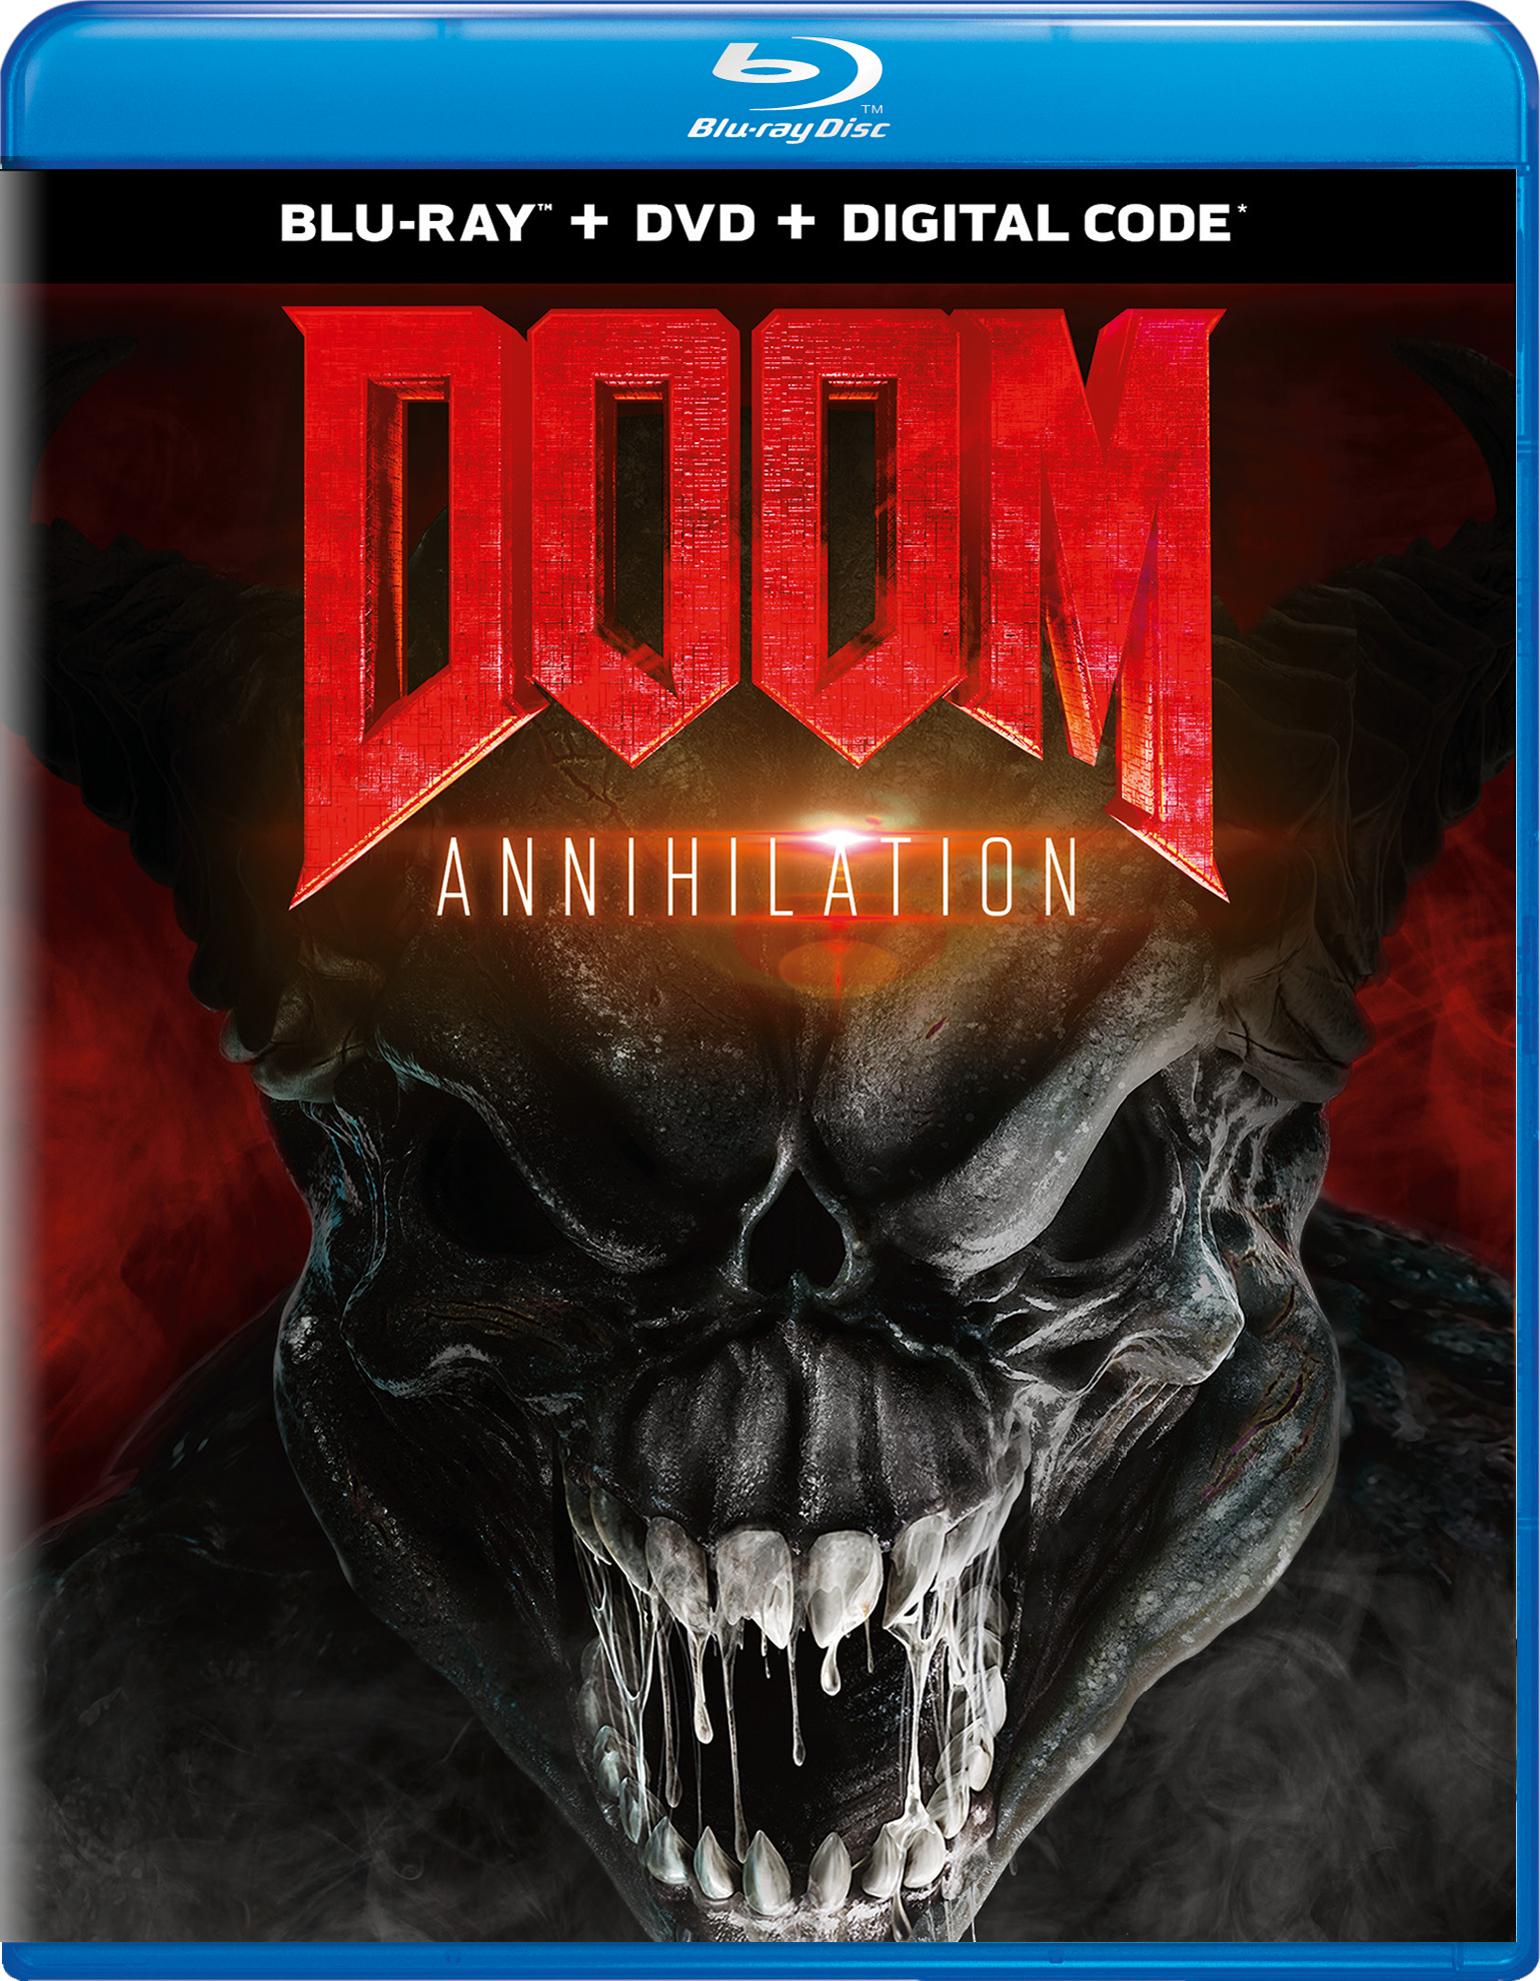 DOOM ANNIHILATION (2019) 1080p BluRay x264-ROVERS